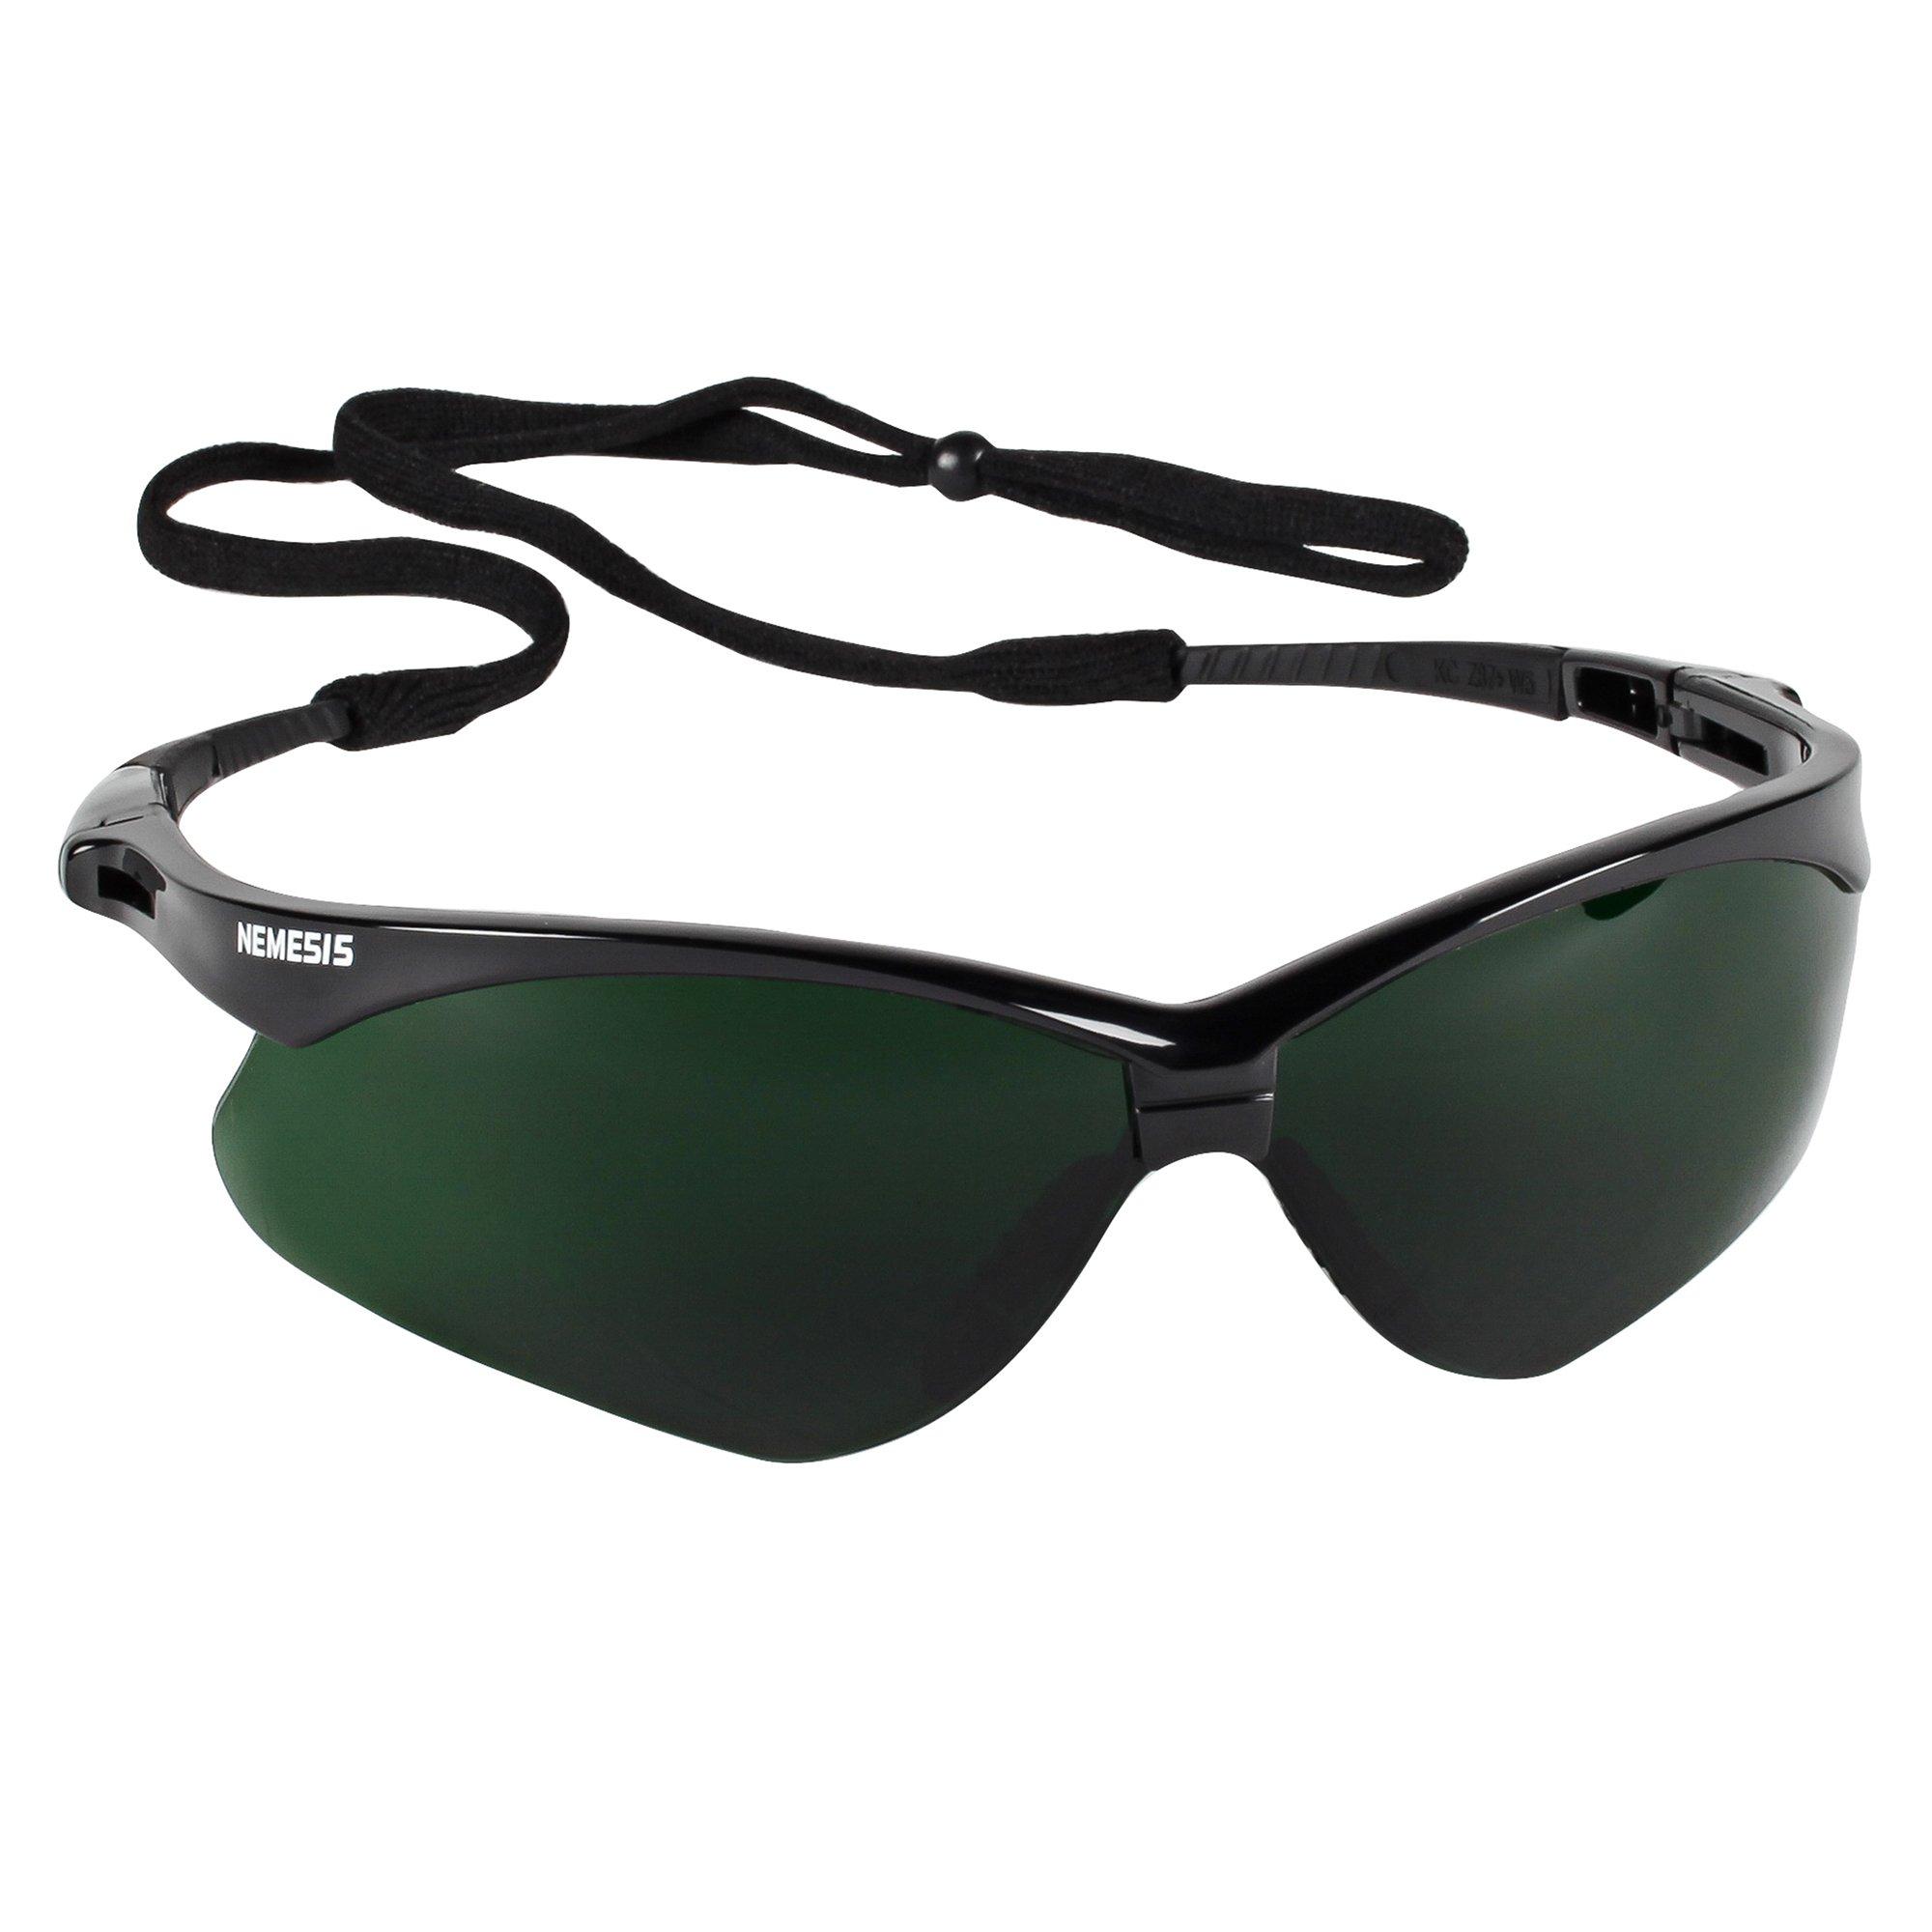 Jackson Safety V30 Nemesis Safety Glasses (25671), IRUV Shade 5.0 Lenses with Black Frame, 12 Pairs / Case by KLEENGUARD